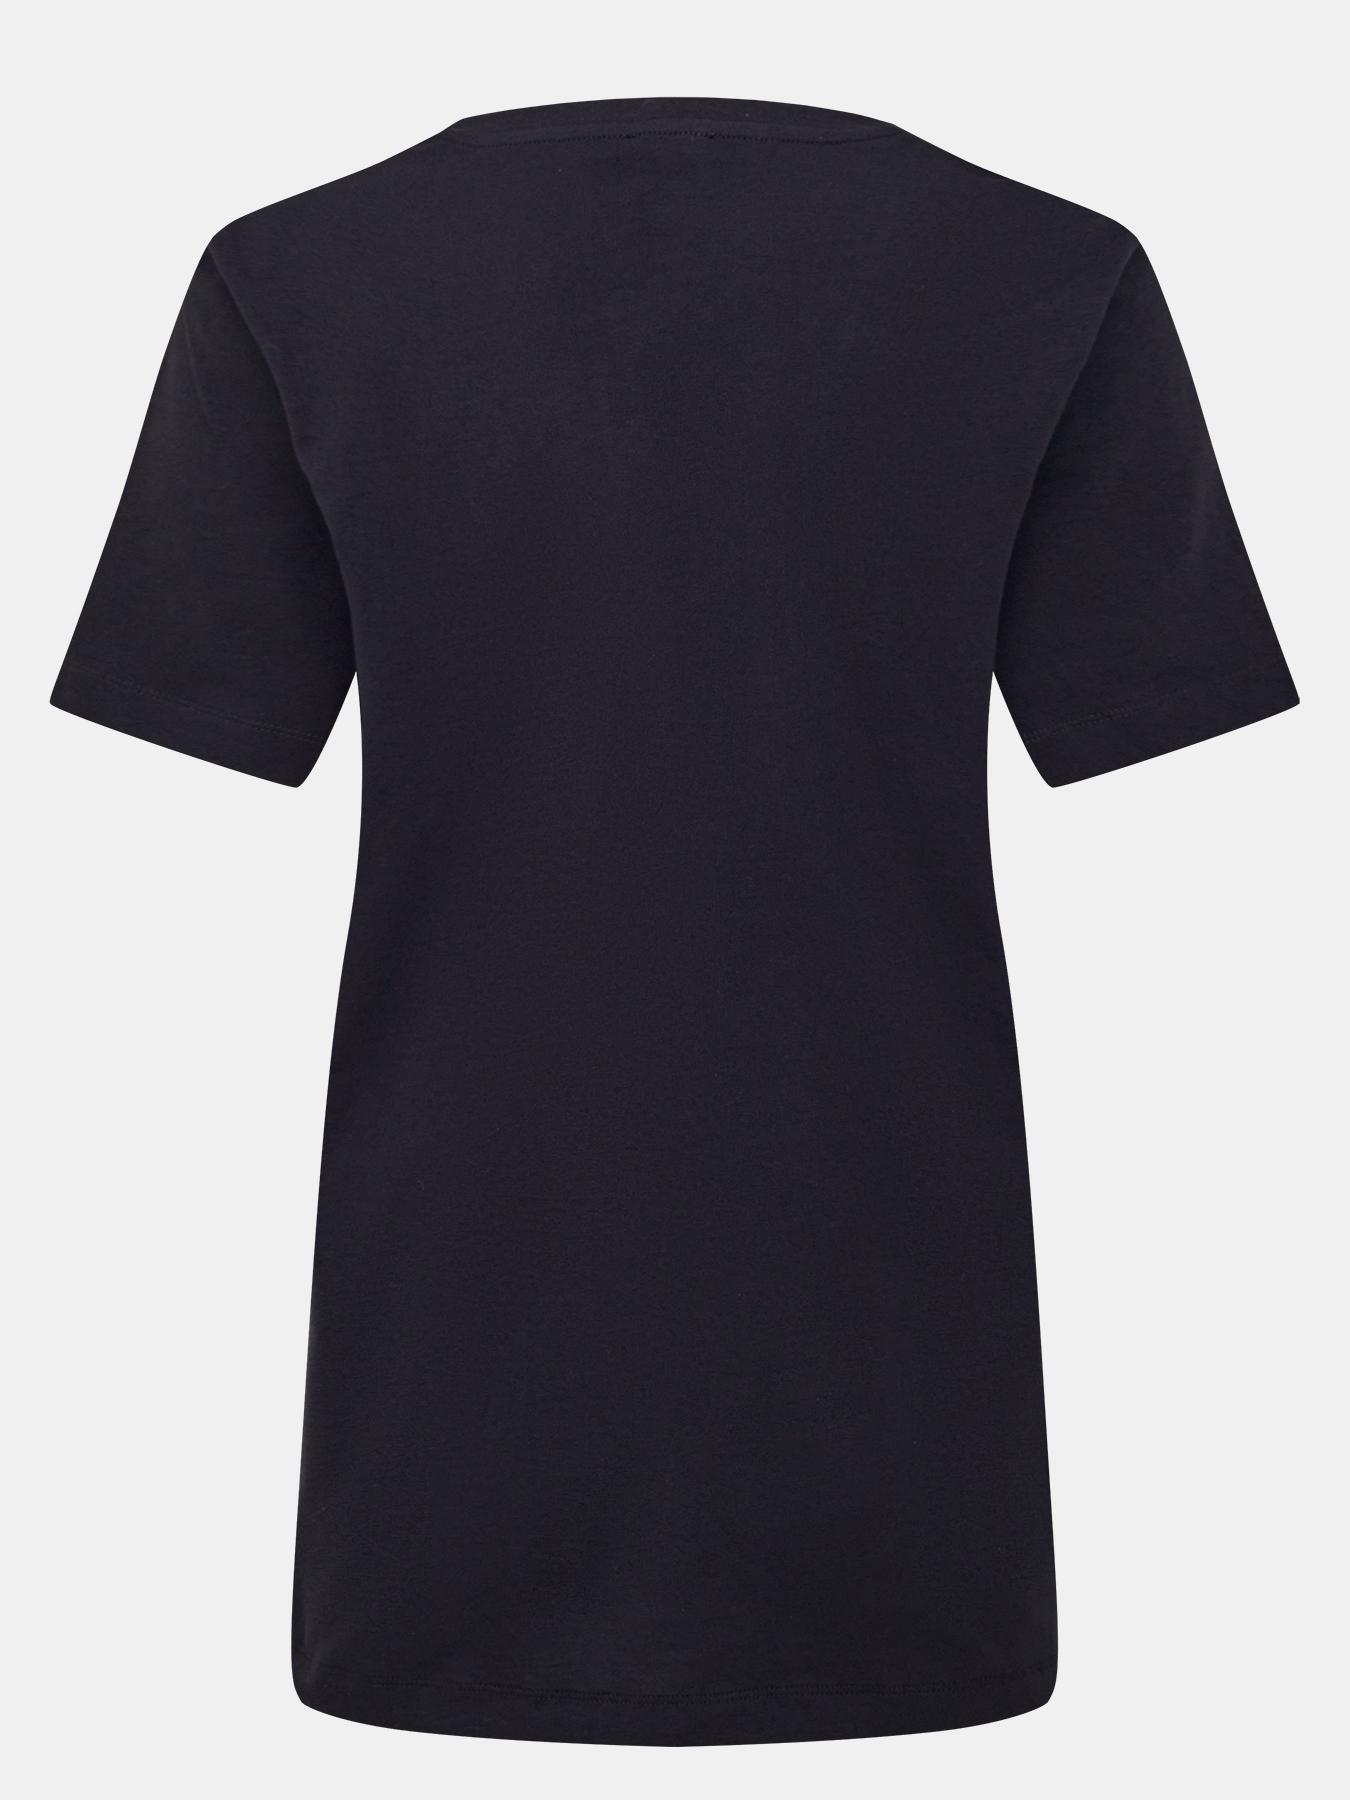 Фуфайка (футболка) Persona by Marina Rinaldi Футболка цена 2017